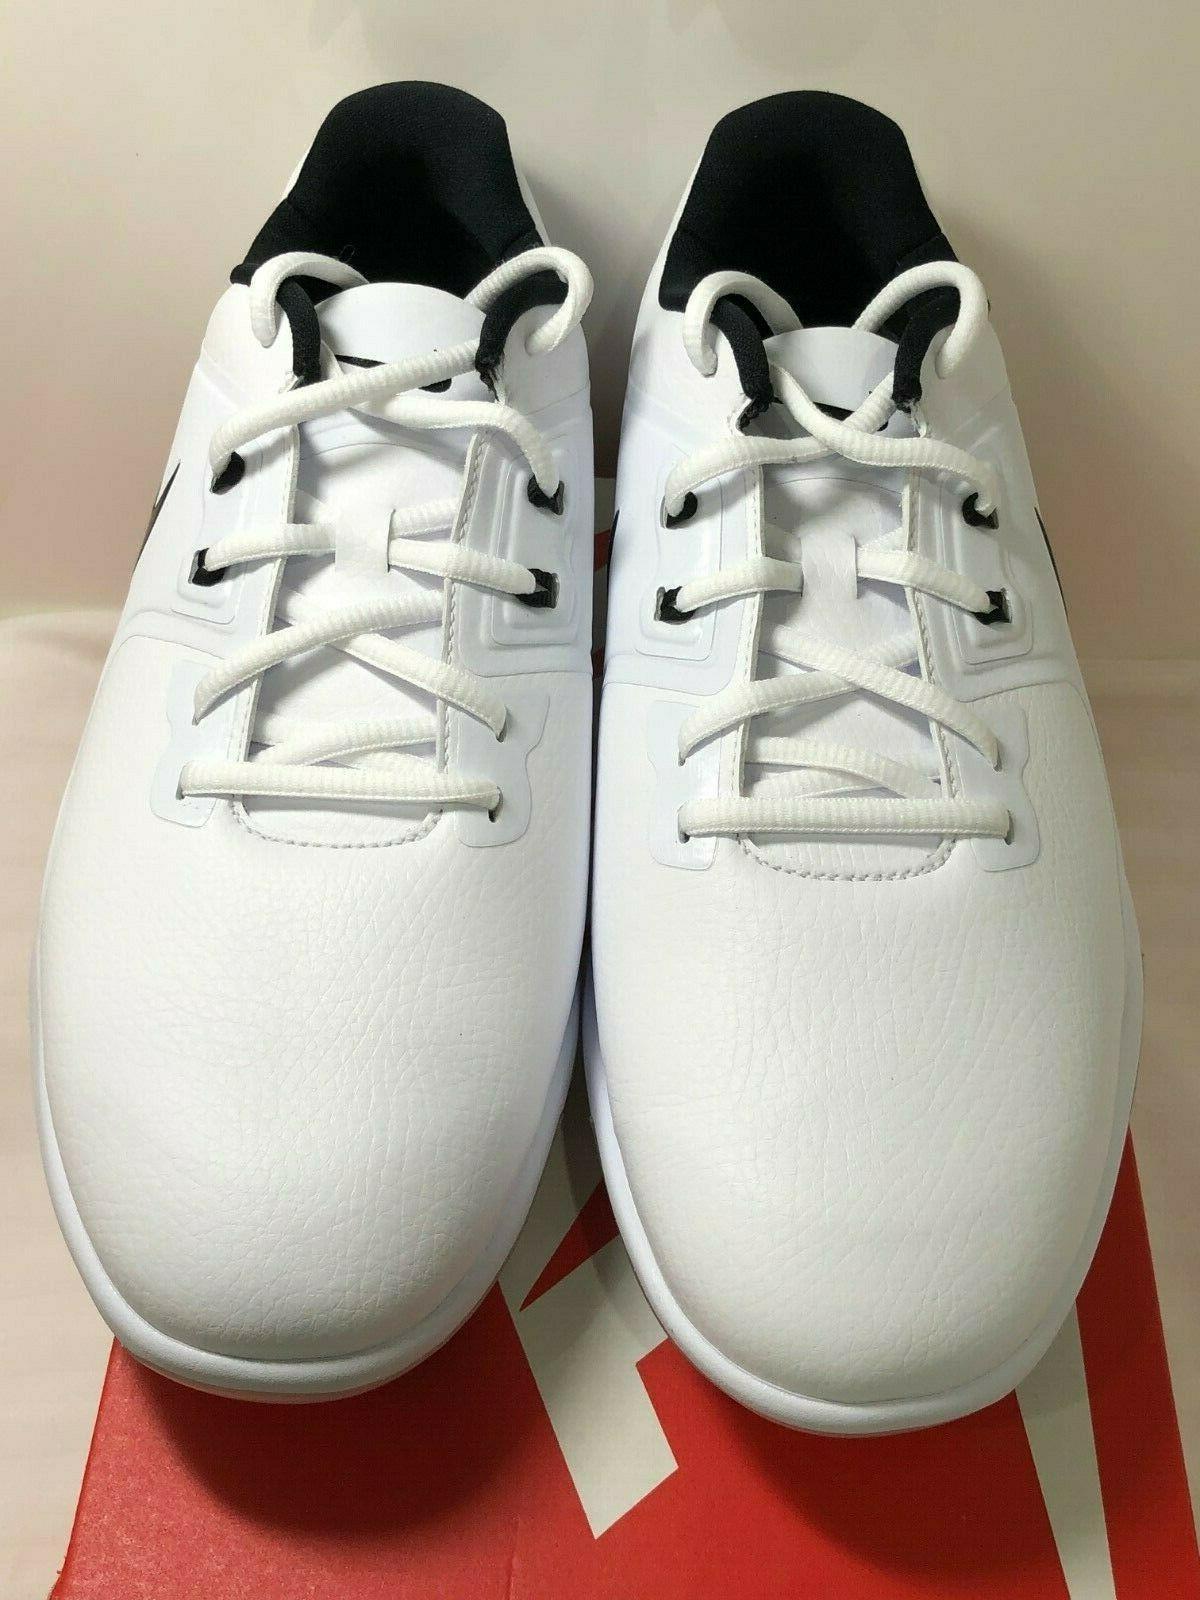 New Mens Nike Vapor Pro Golf Shoes Cleats White Black  AQ219